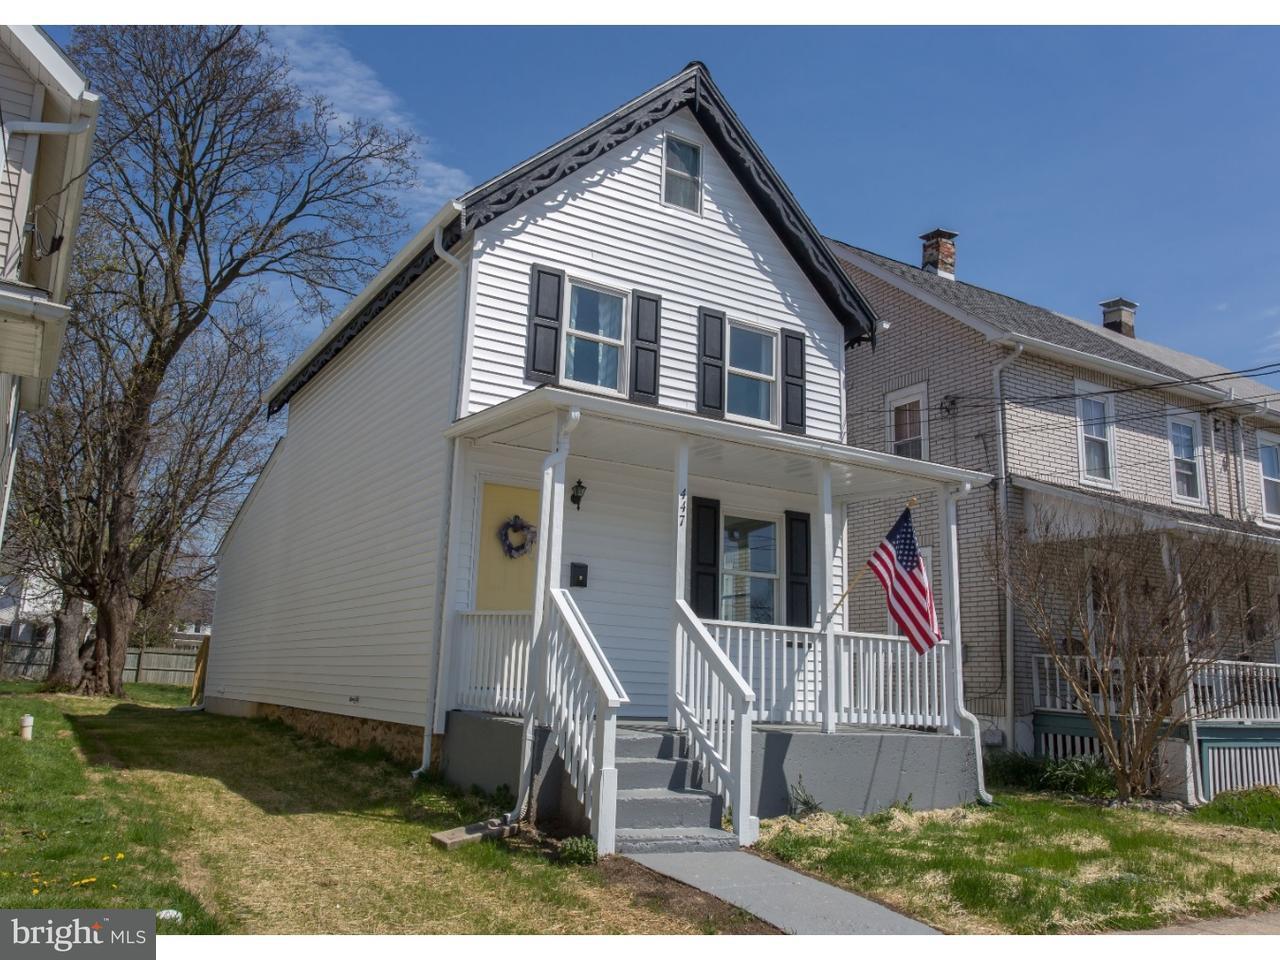 Single Family Home for Rent at 447 HODGSON Street Oxford, Pennsylvania 19363 United States